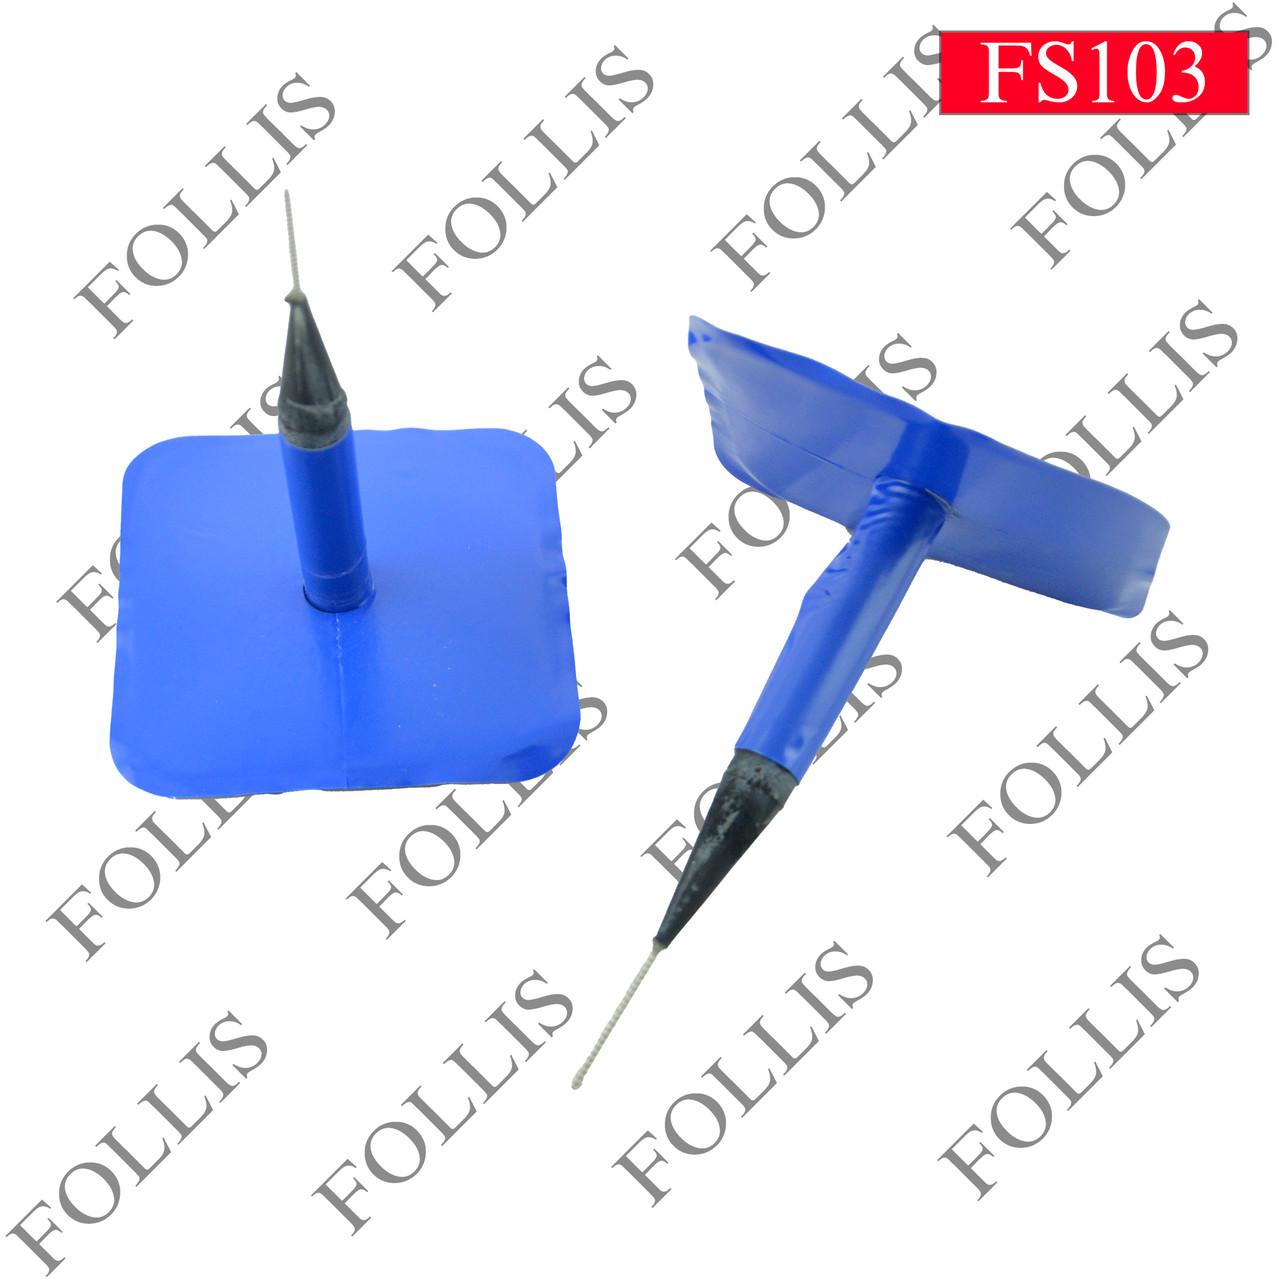 S-775 (PATCH SIZE (100*100)) POLE DIA 14MM